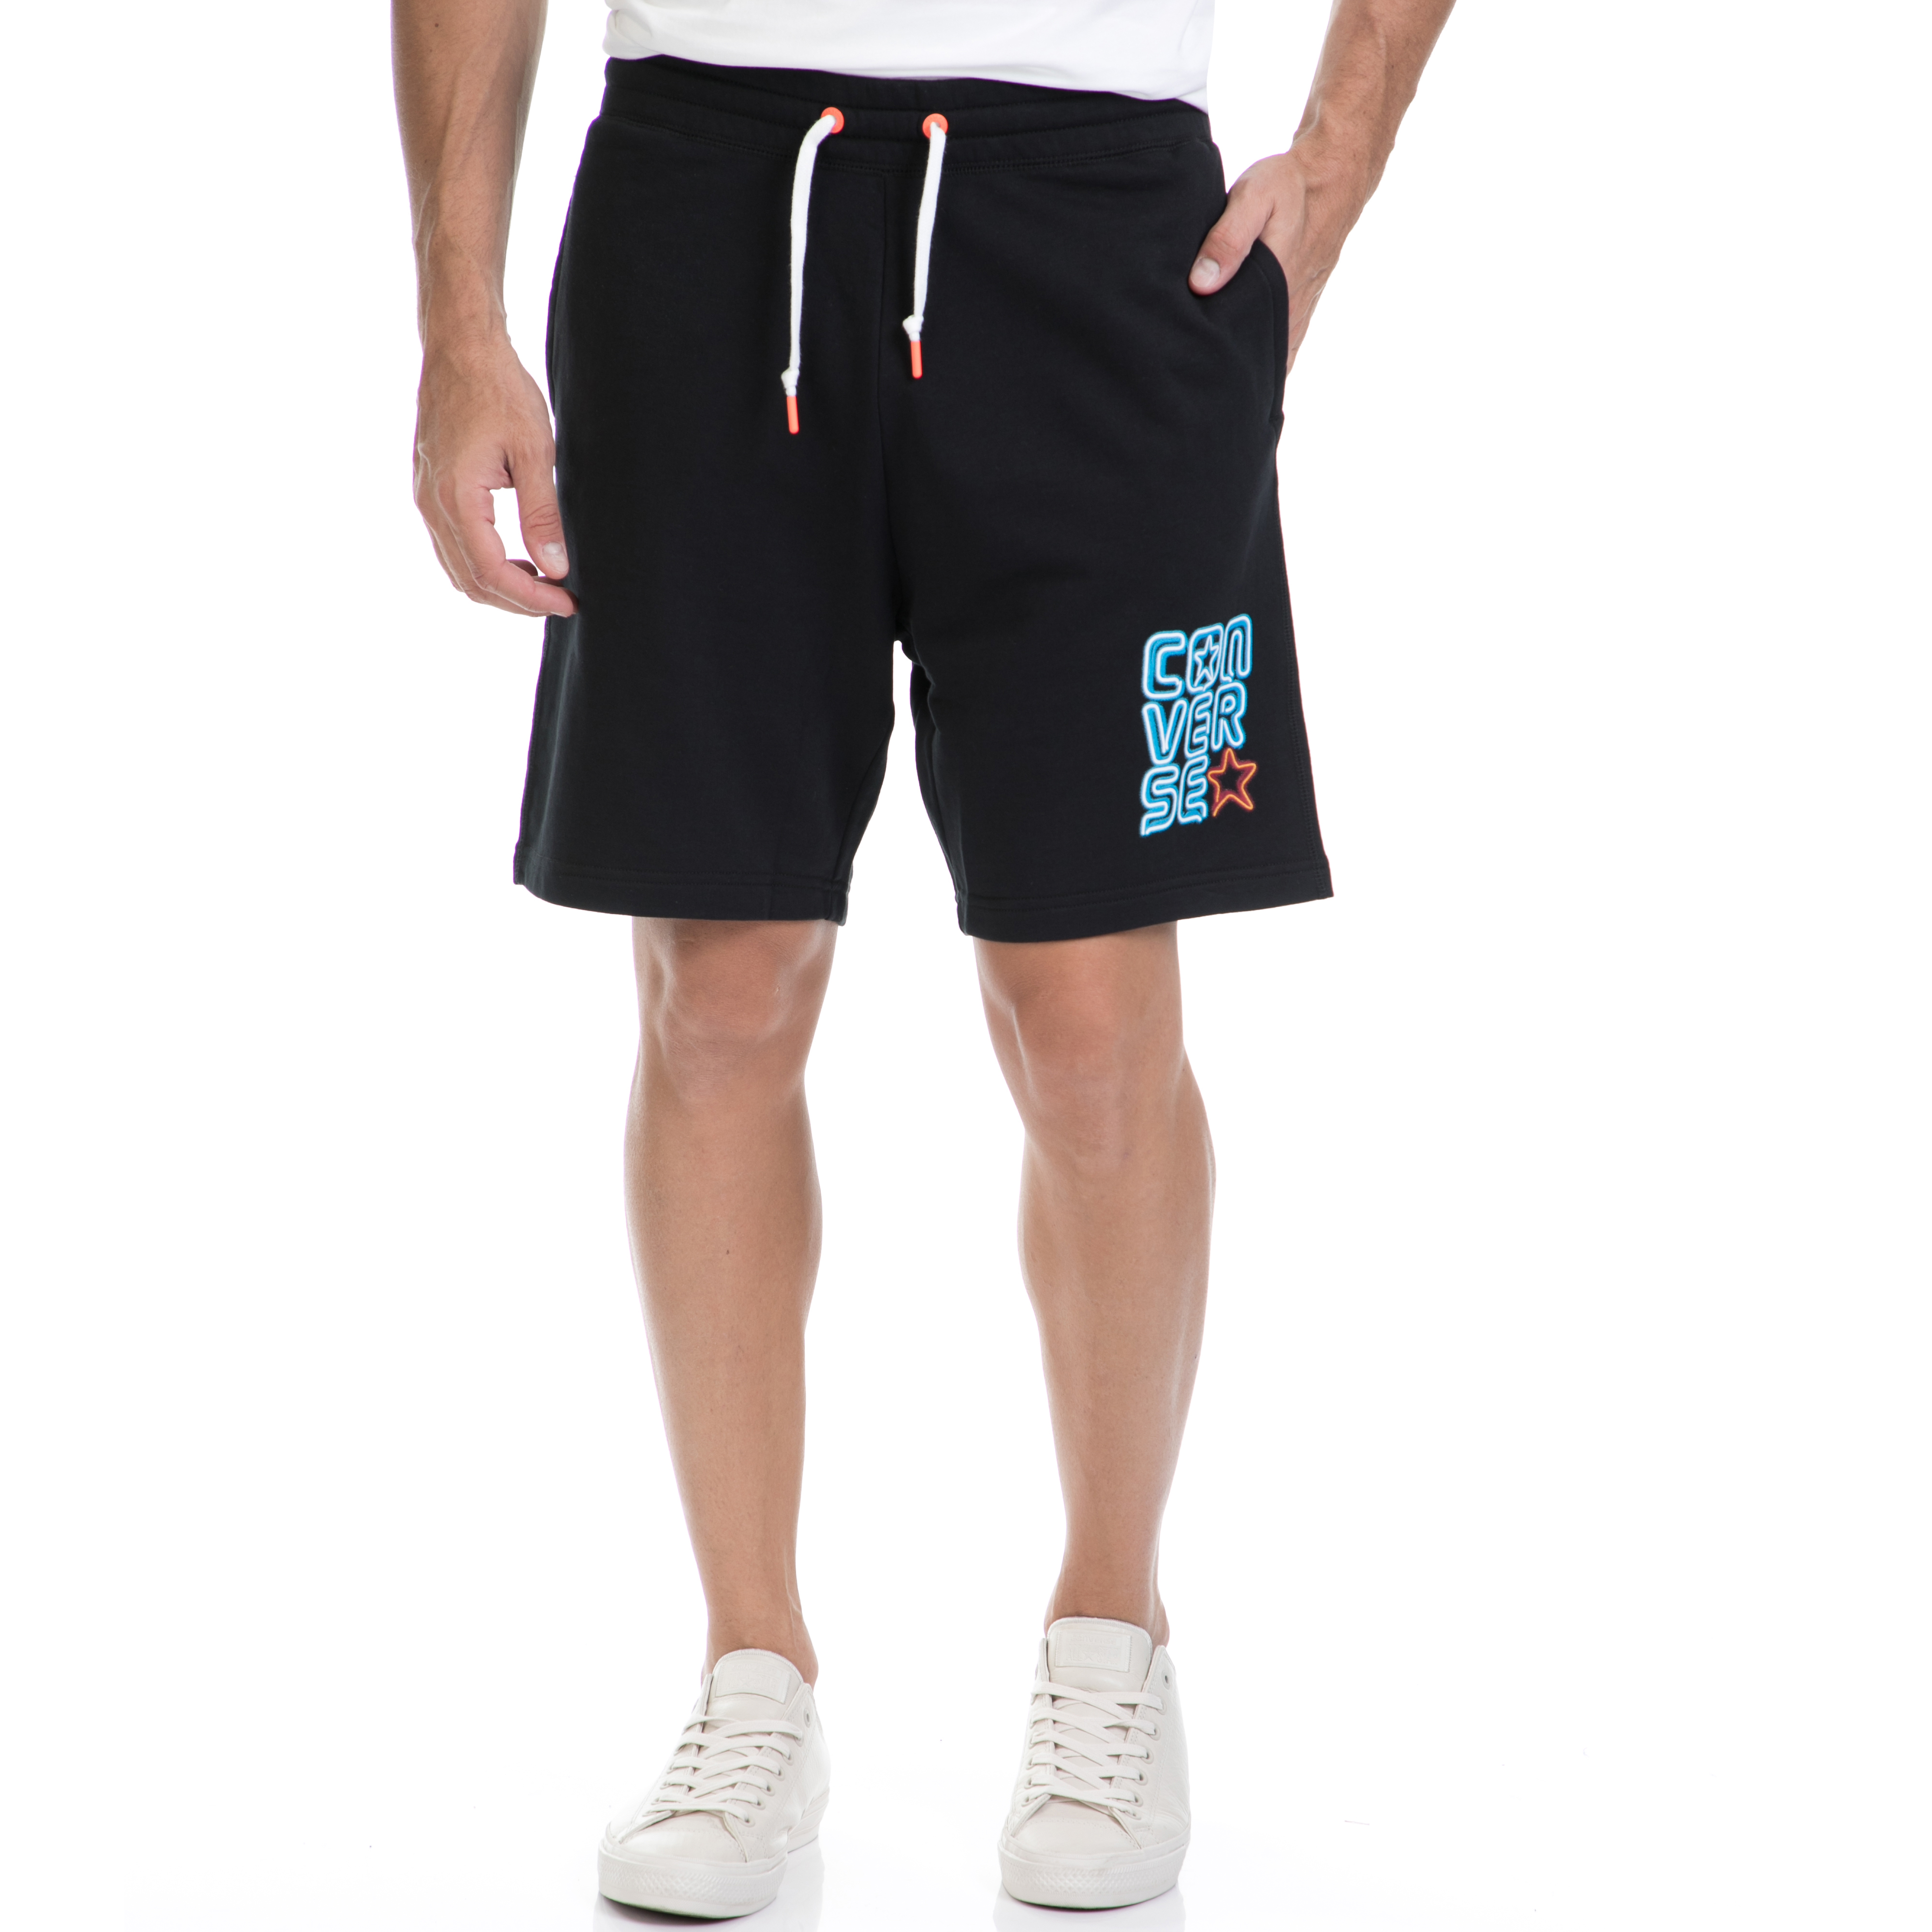 CONVERSE - Αντρική βερμούδα CONVERSE μαύρη ανδρικά ρούχα σορτς βερμούδες αθλητικά